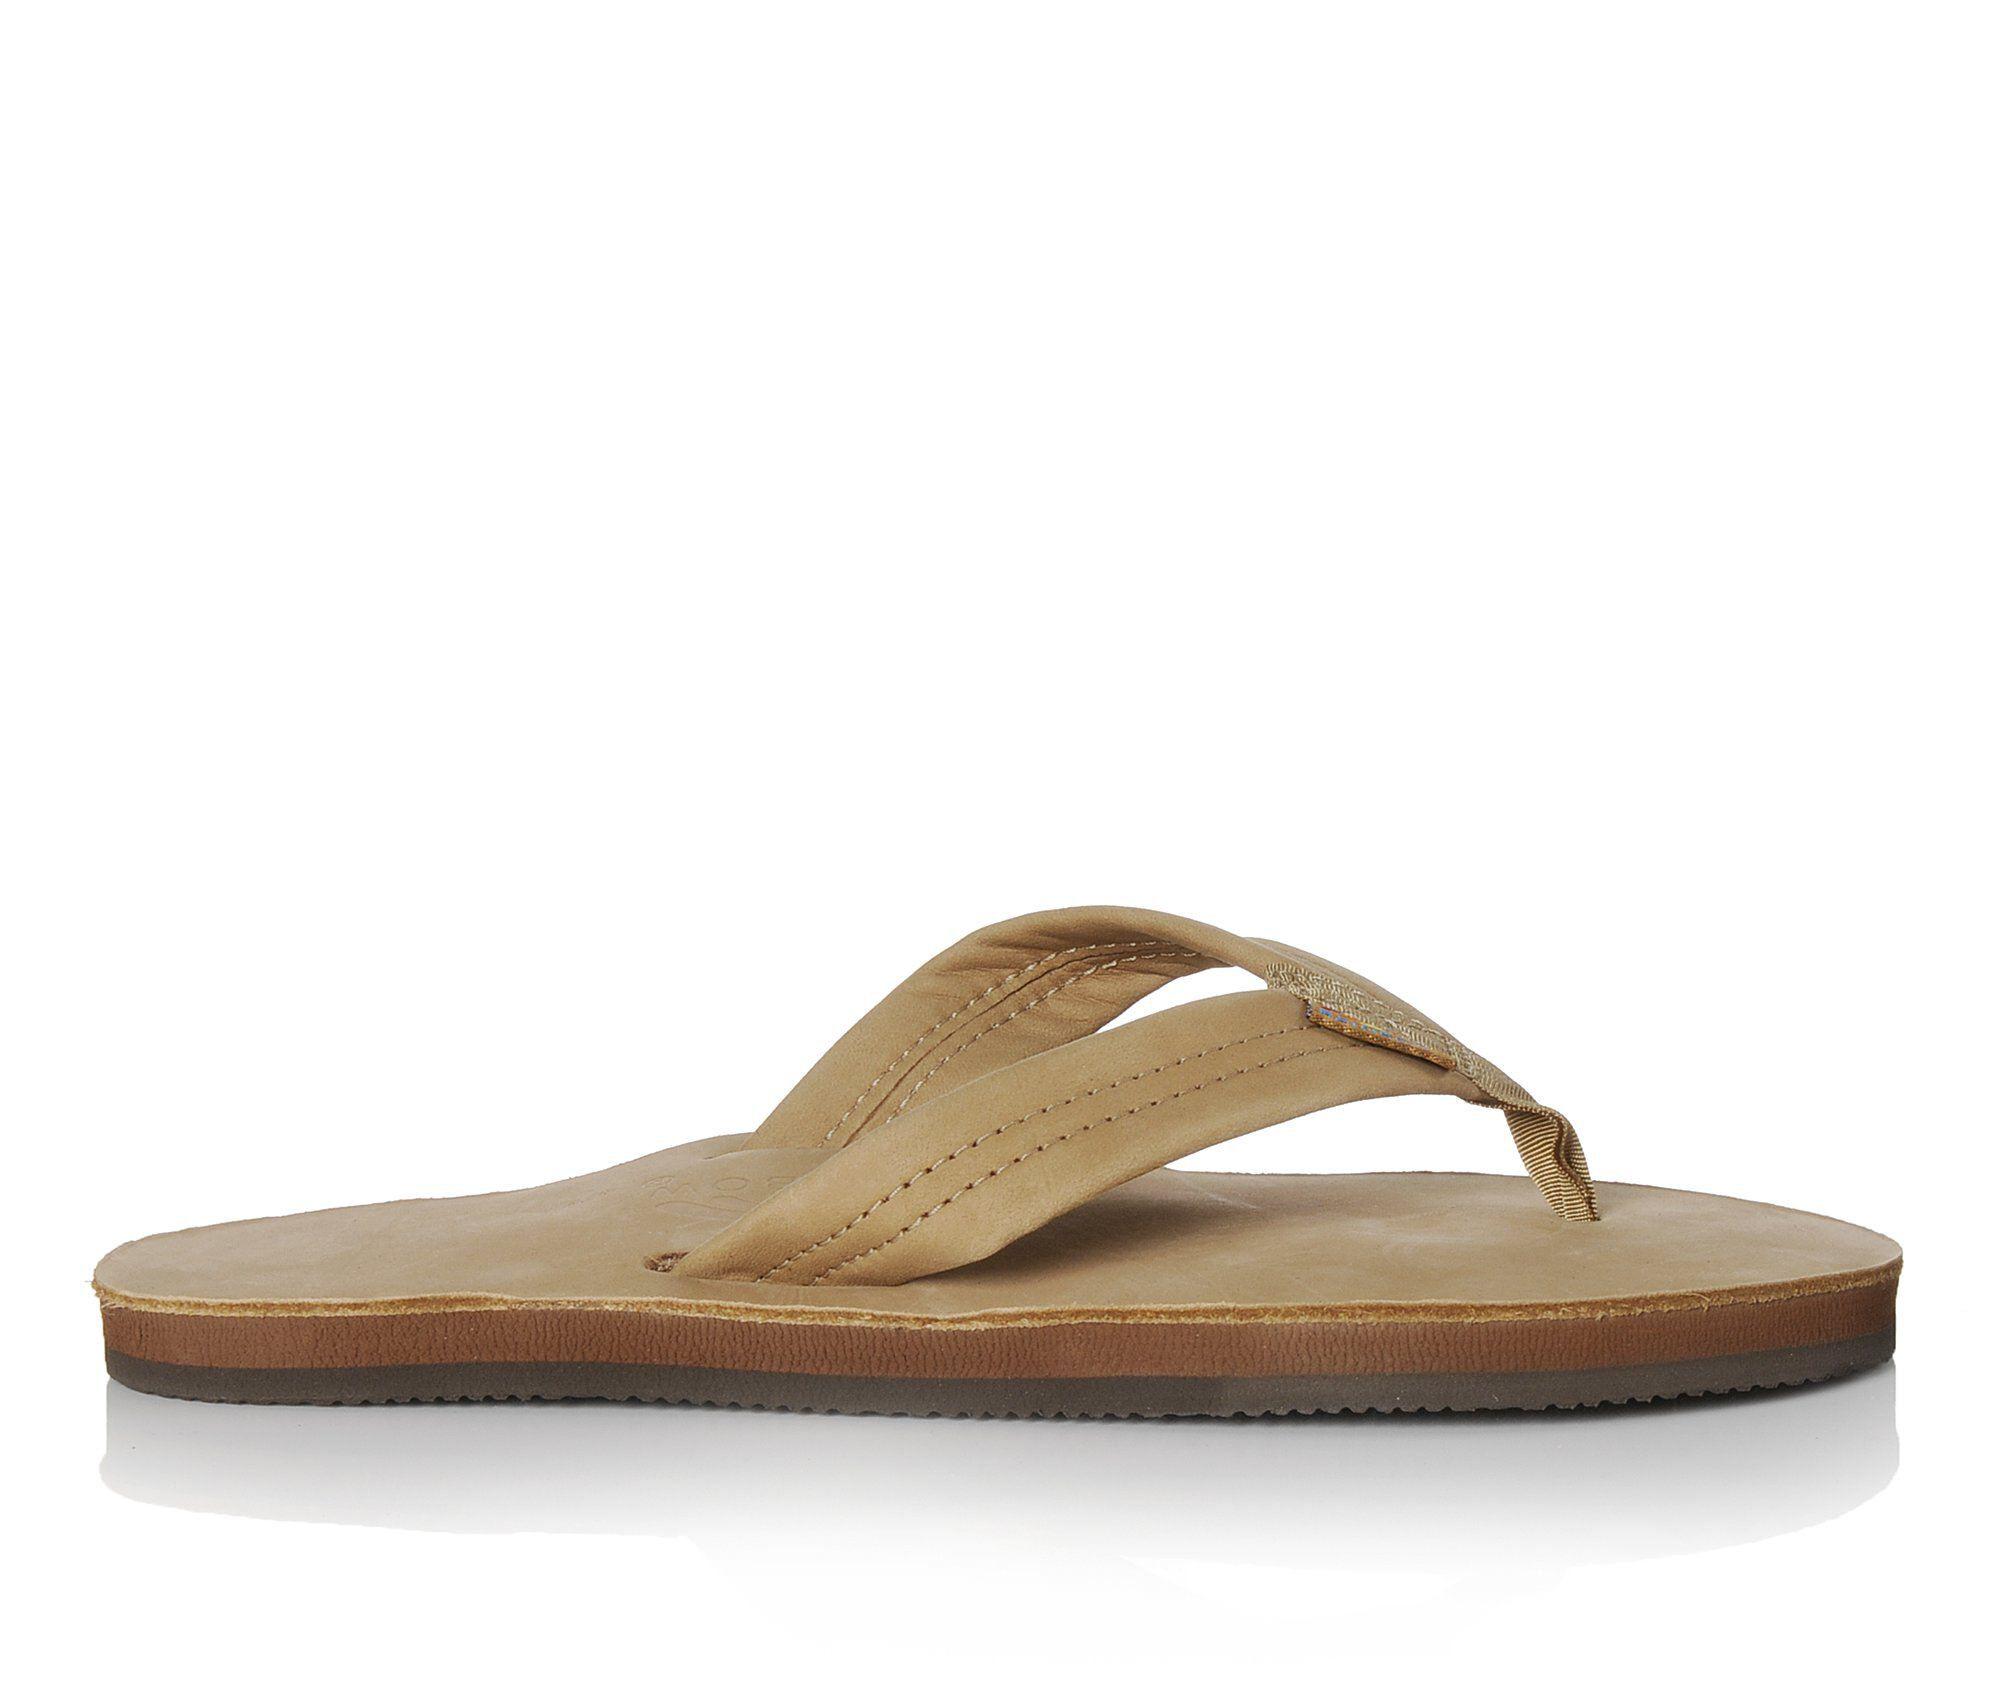 uk shoes_kd1242